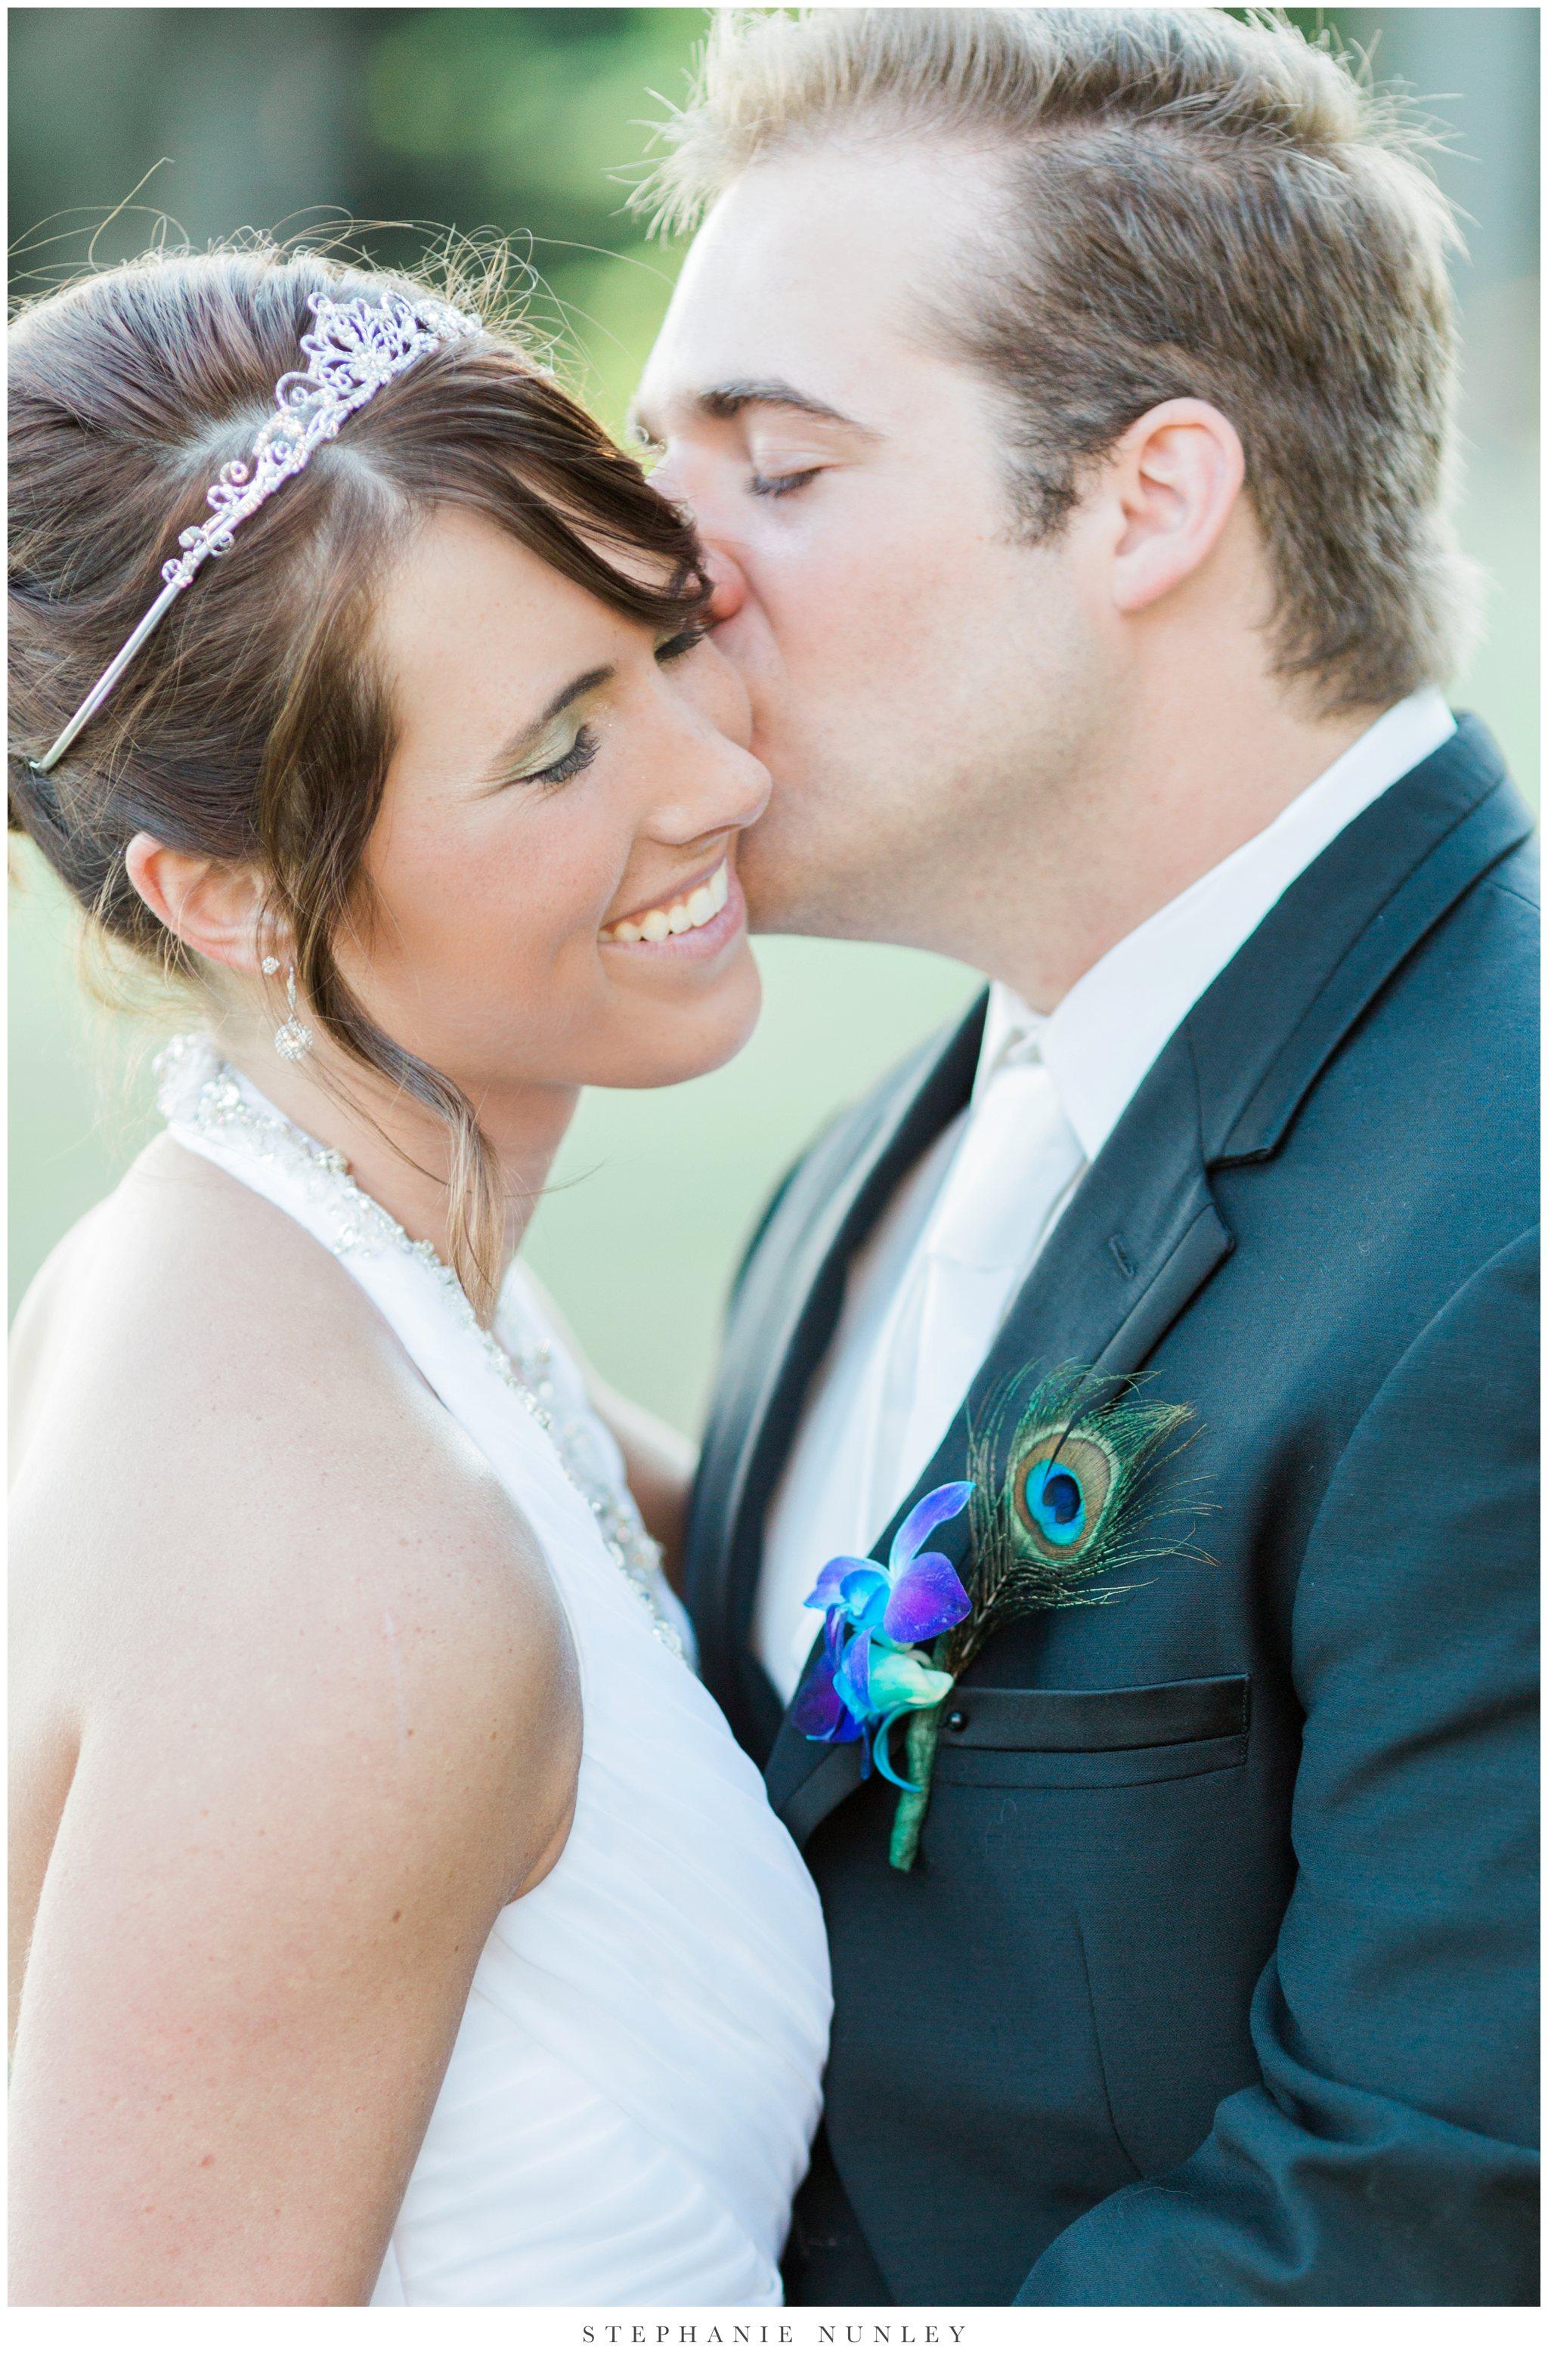 fine-art-destination-wedding-photographer-0061.jpg